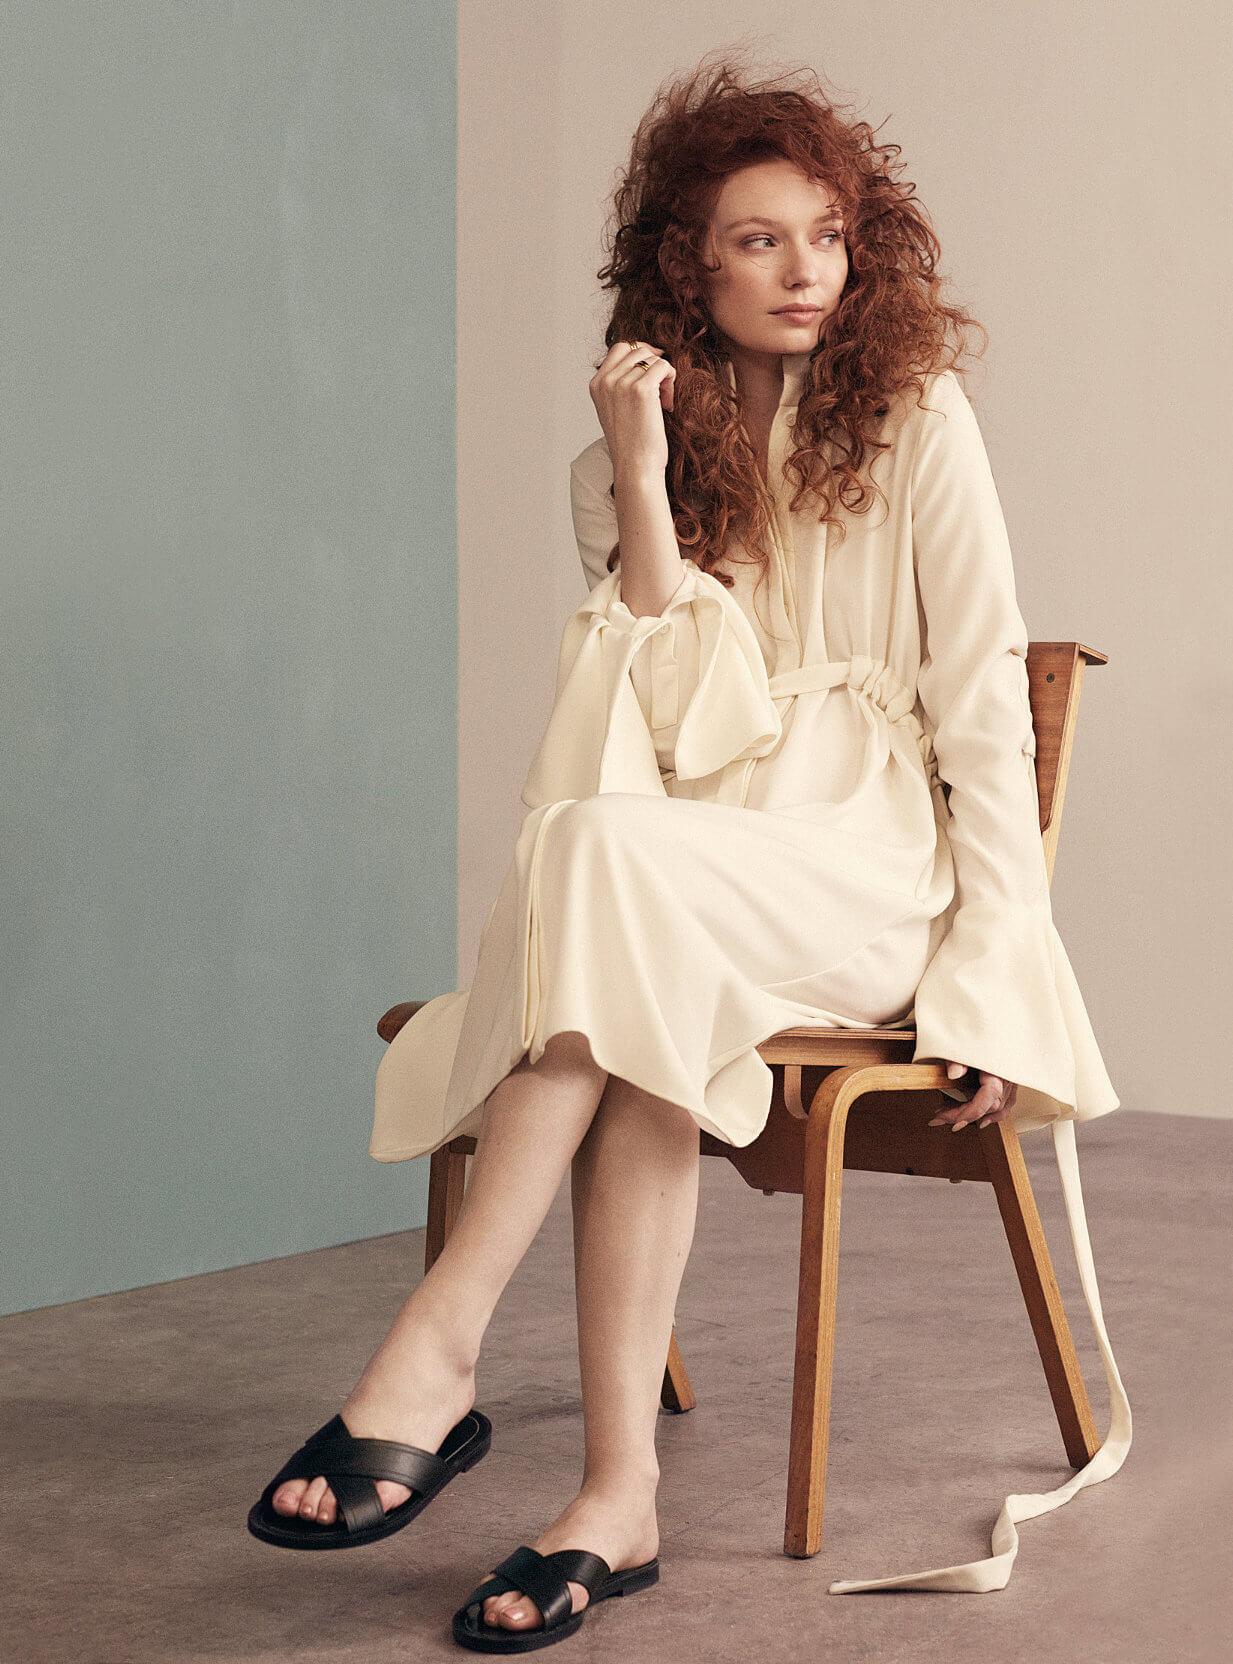 Eleanor Tomlinson hot feet pics